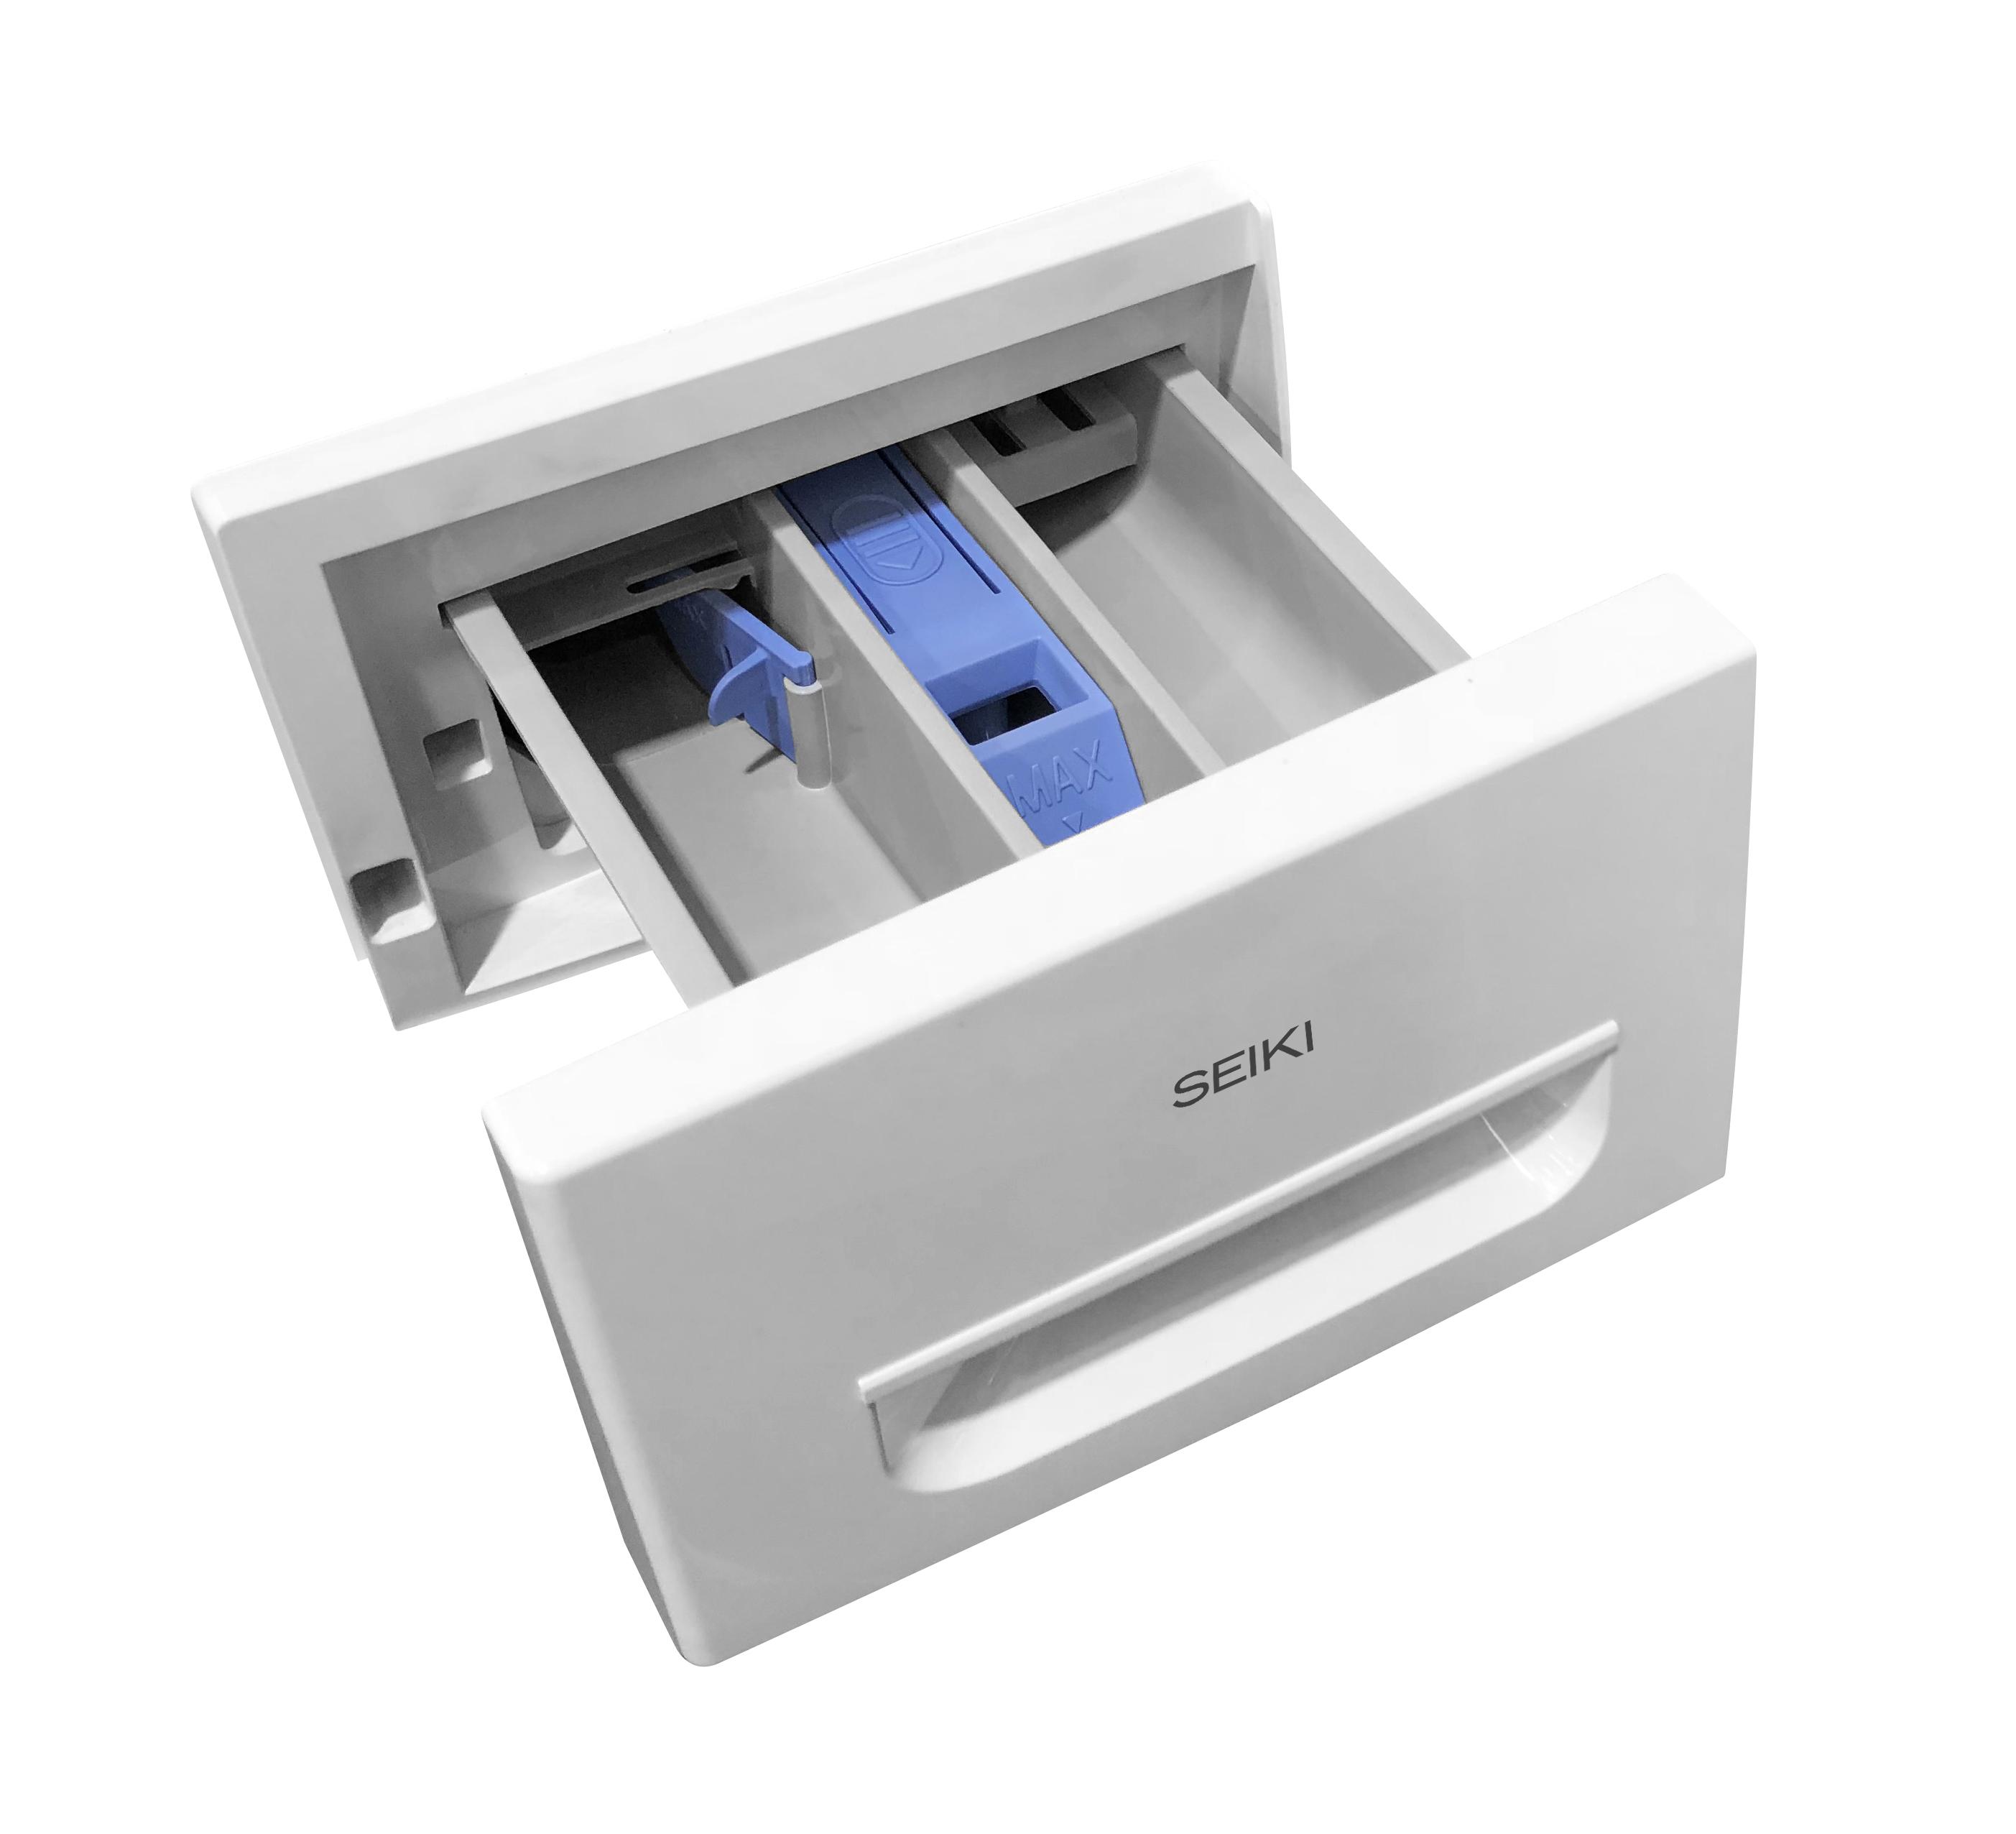 SC-1000AU9FLIN - Tablet Dispenser